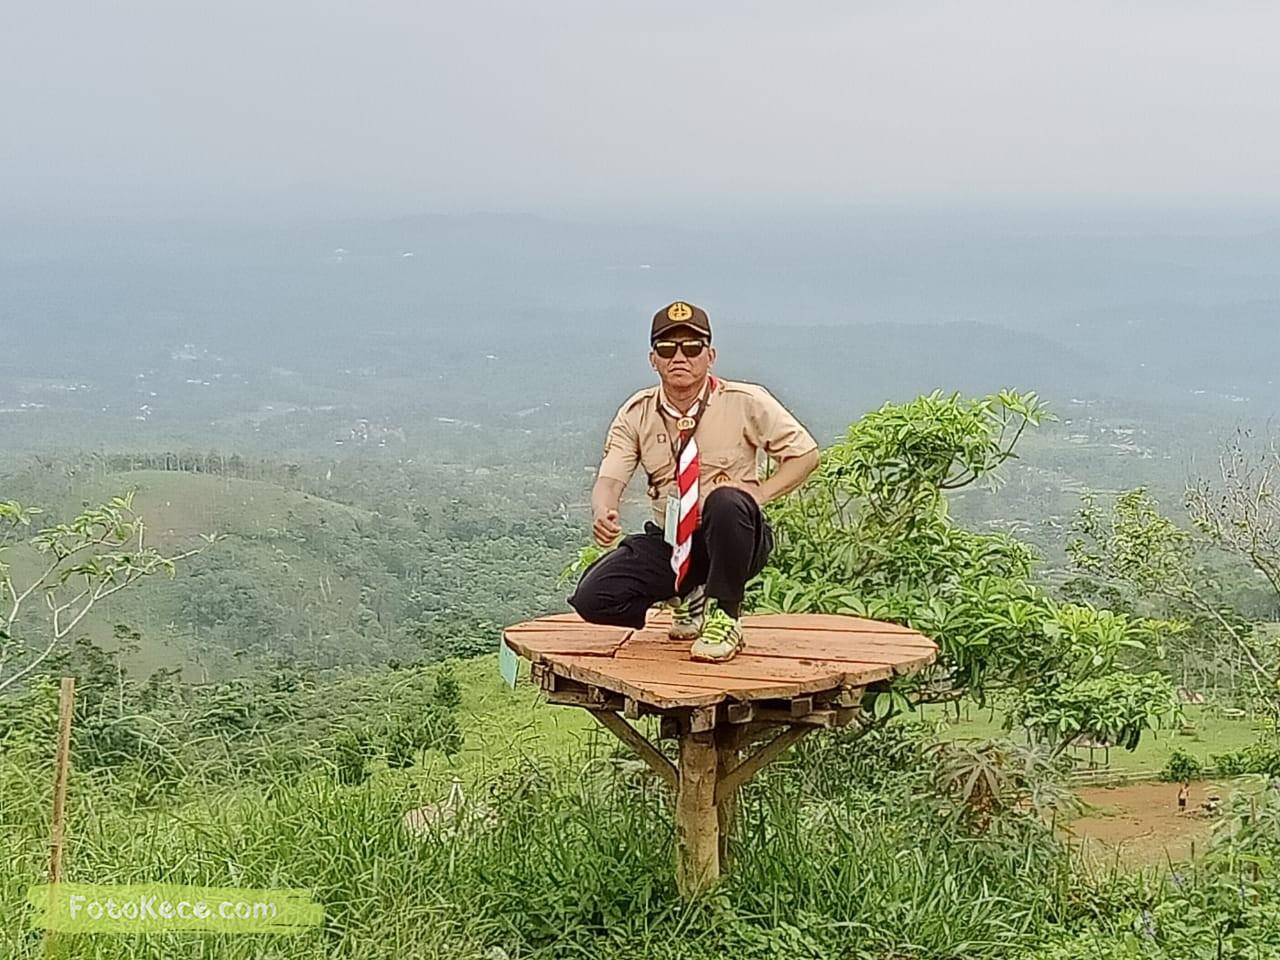 solehundin kehebohan narakarya 1 2020 di wisata alam puncak buluh foto kece 10